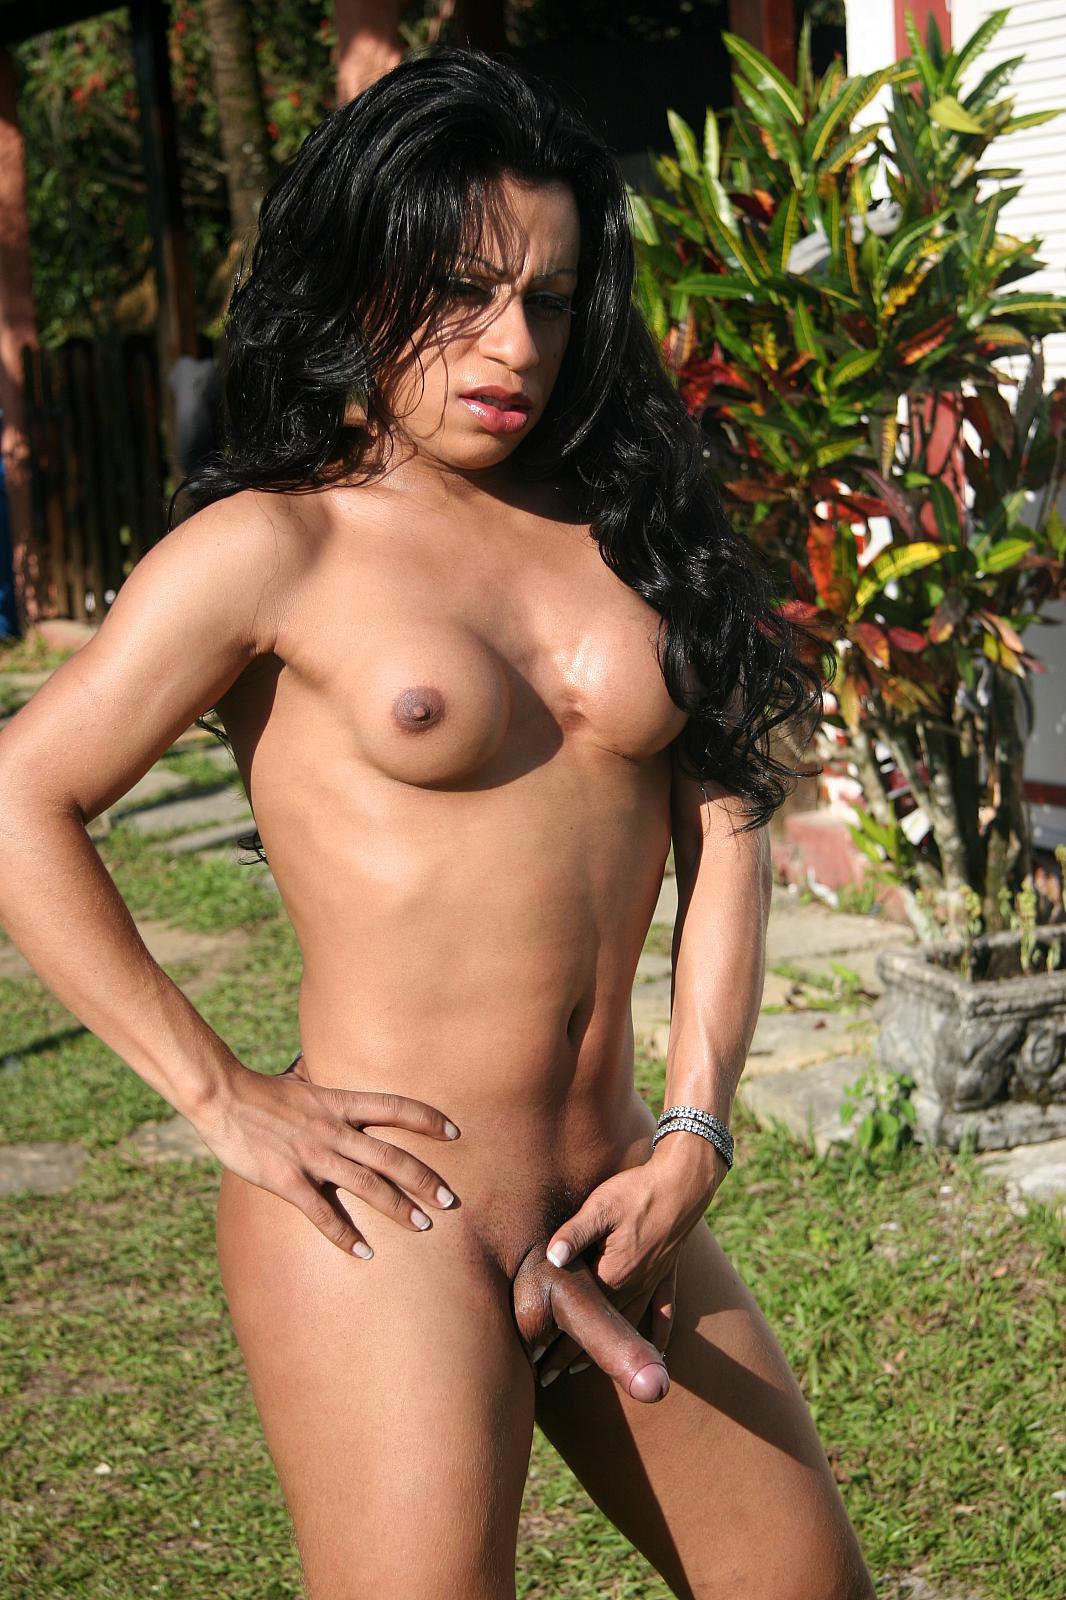 Flirtatious Tranny Alessandra Ferra Enjoying A Latina Pussy